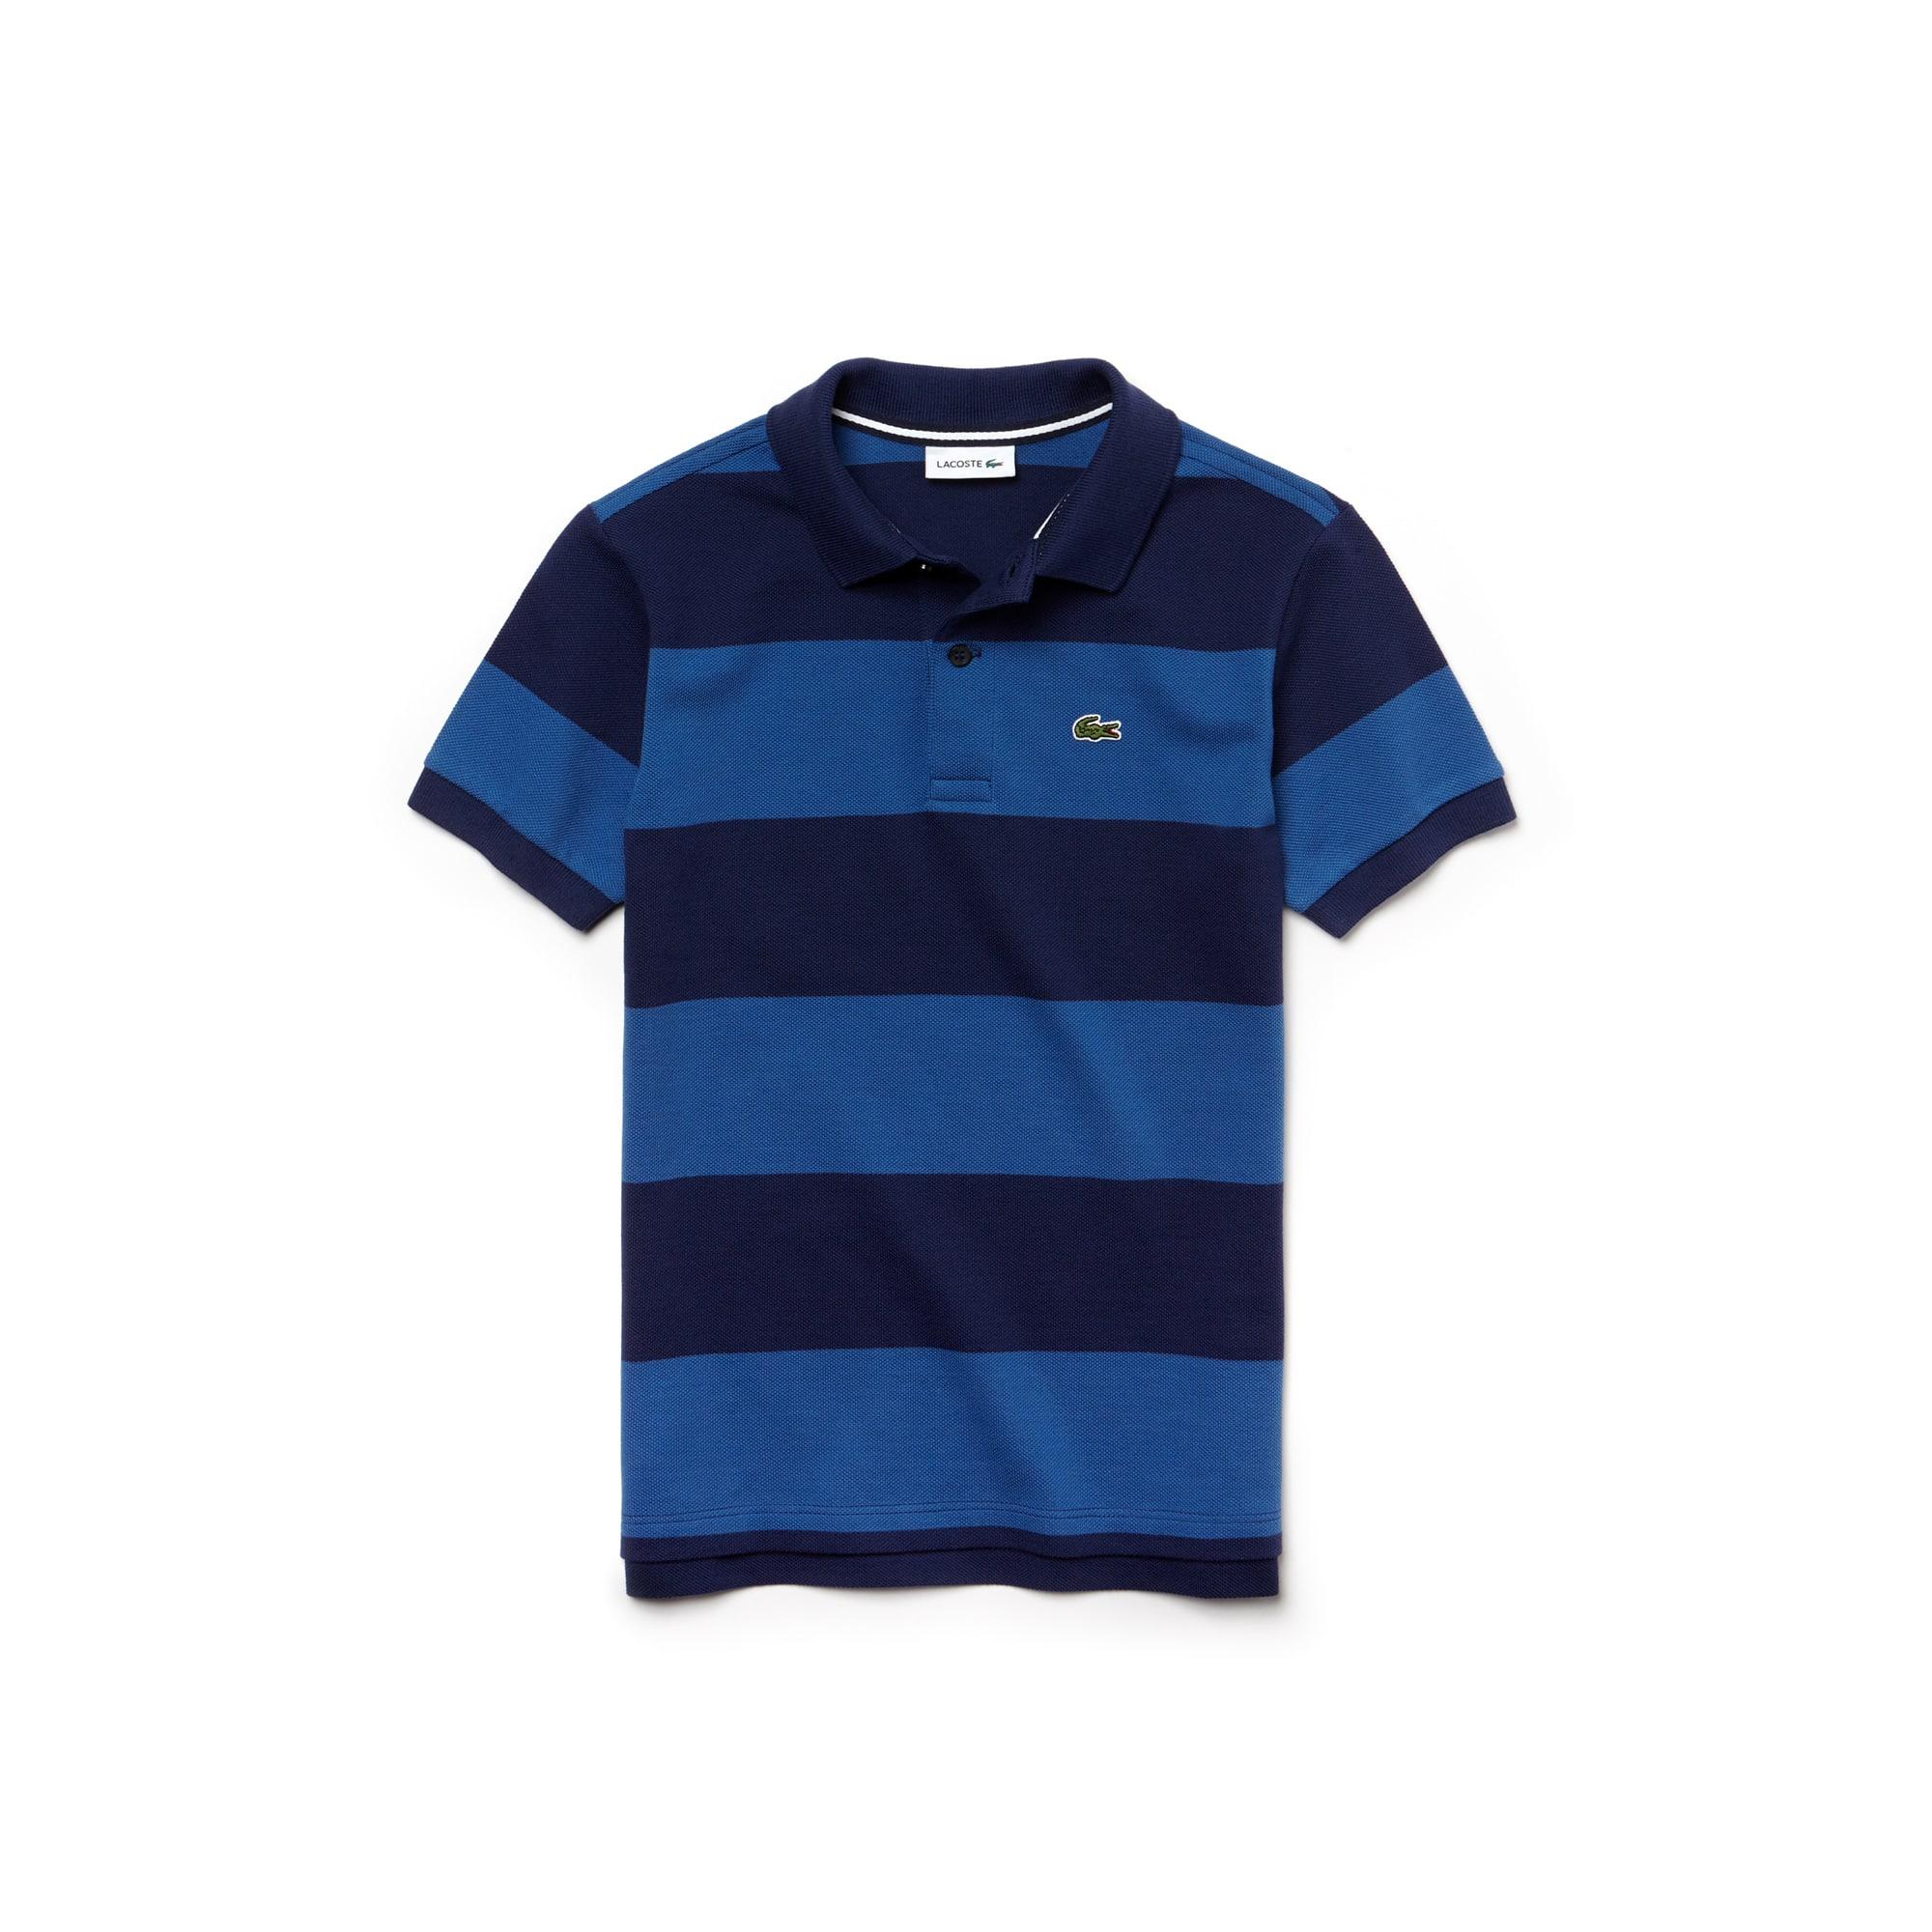 Boys' Lacoste Striped Cotton Petit Piqué Polo